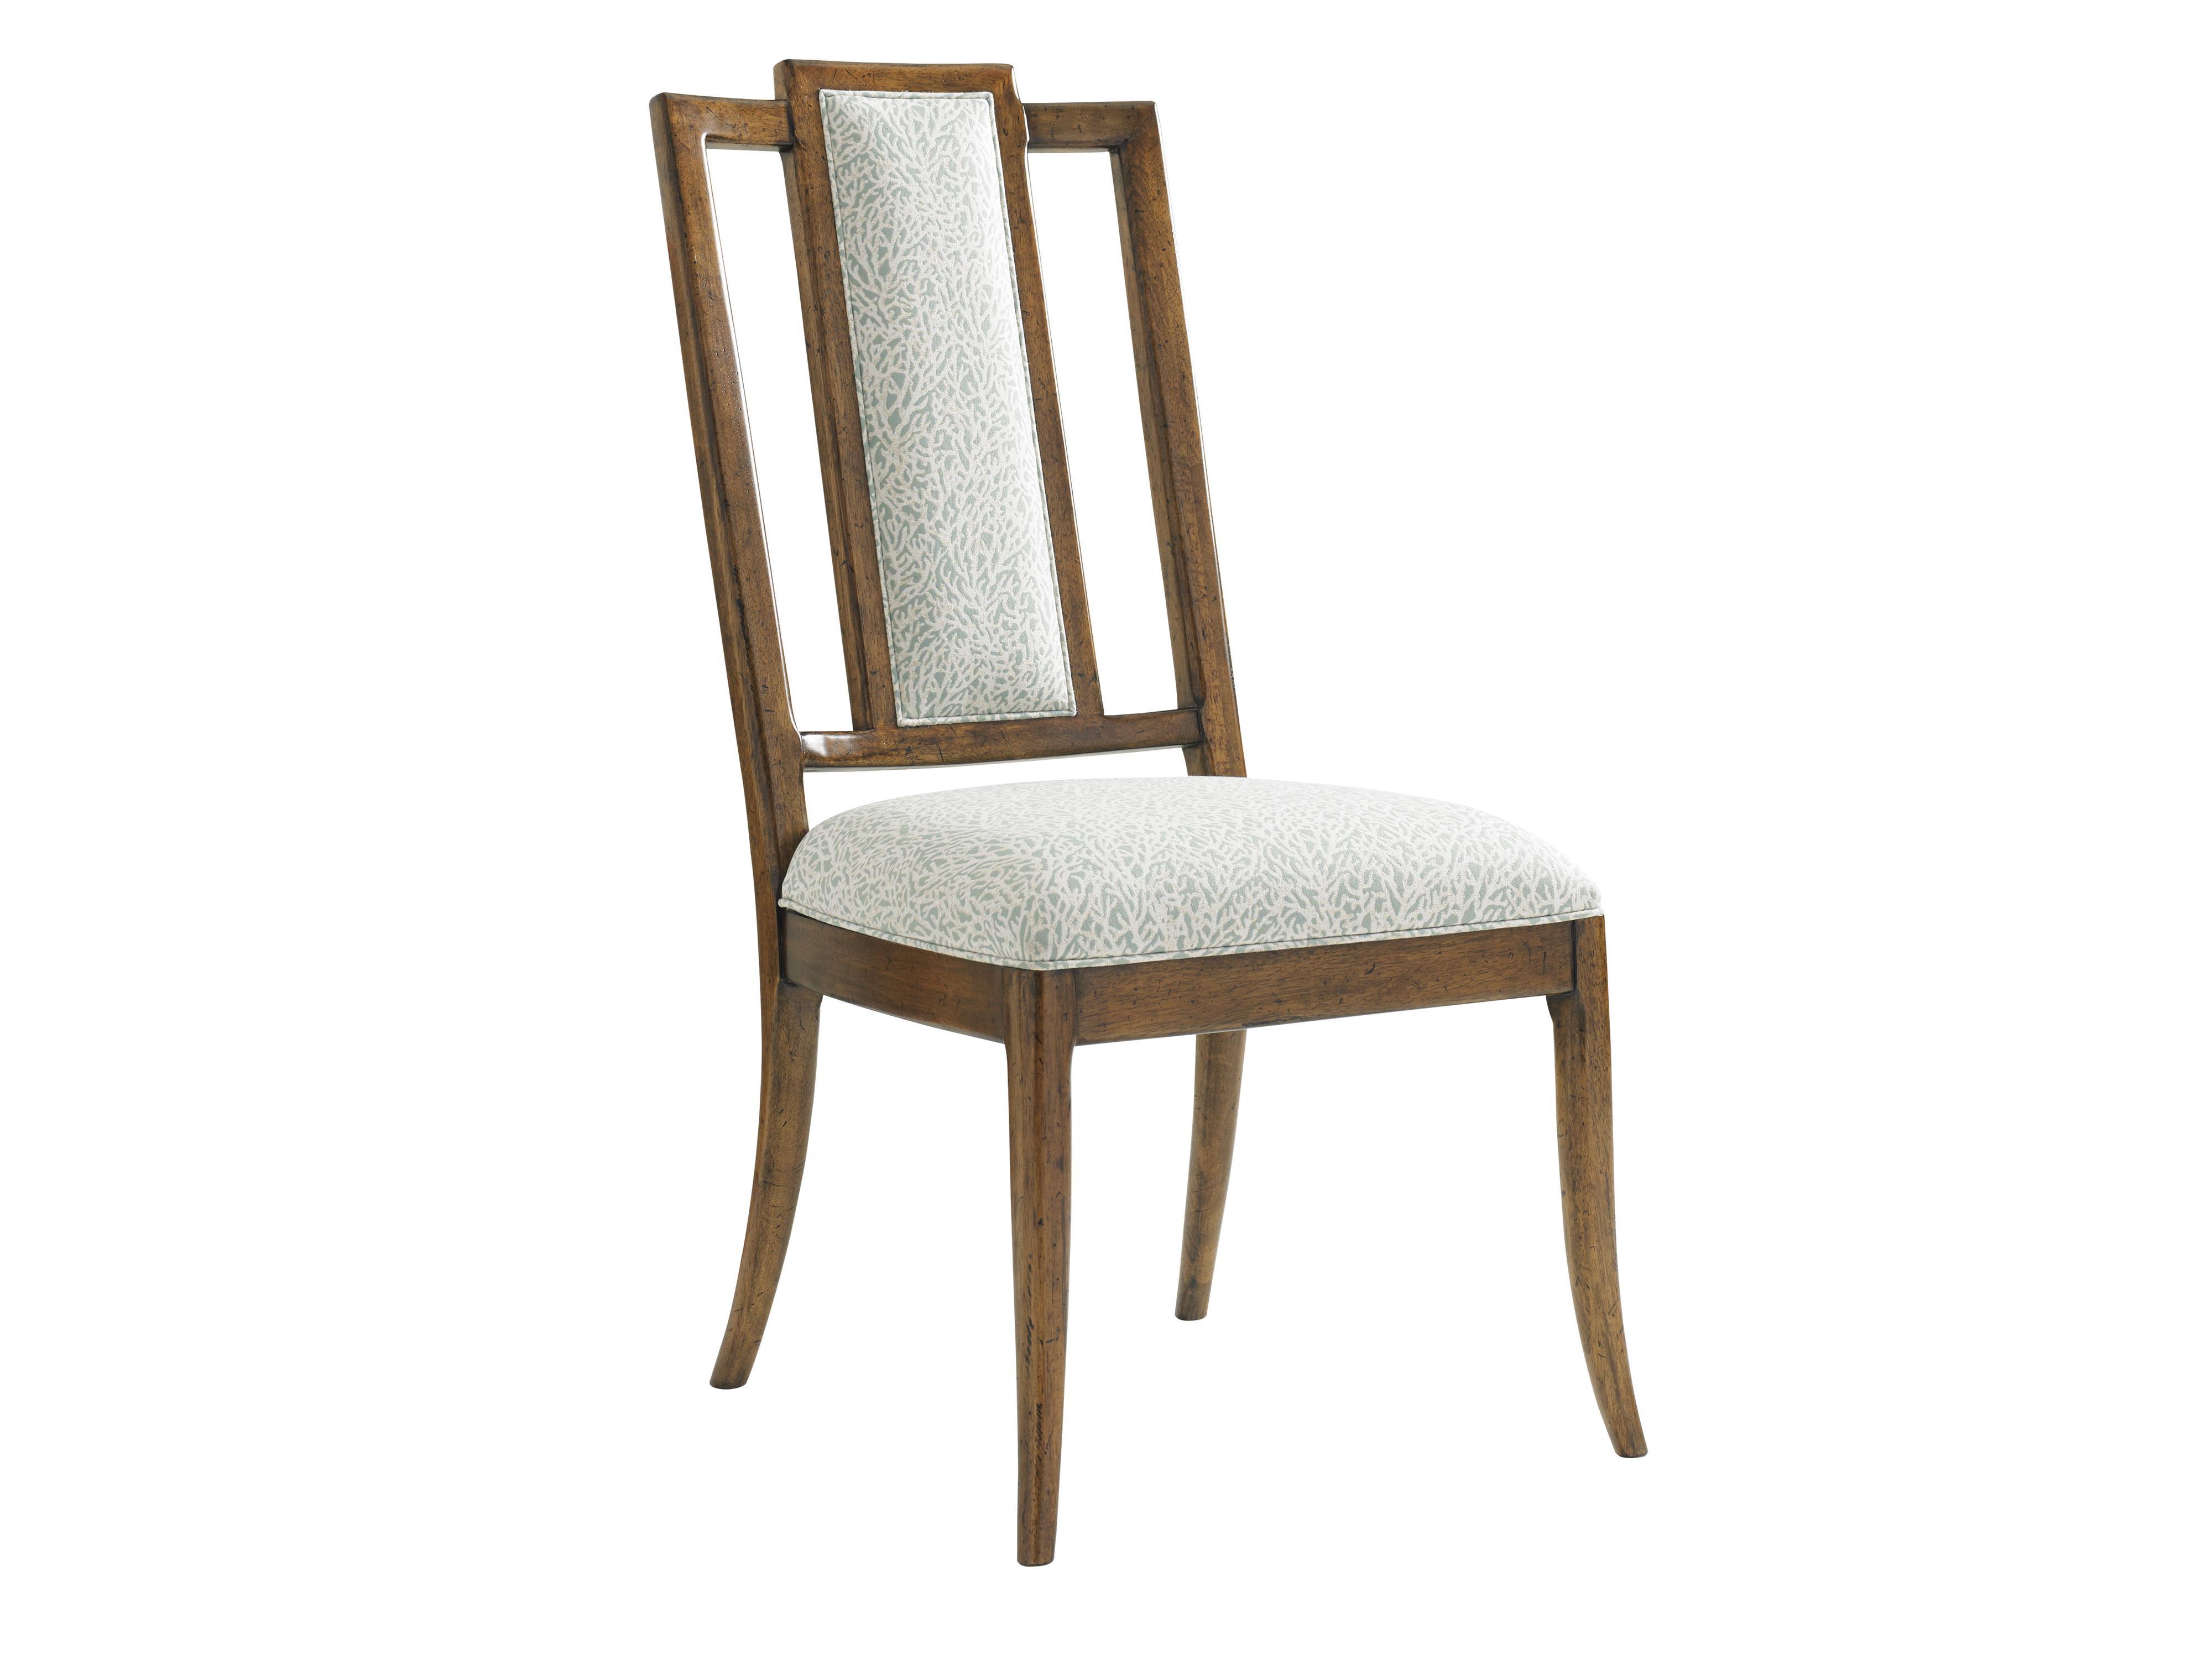 Bali Hai Custom St. Bart's Side Chair by Tommy Bahama Home at Baer's Furniture